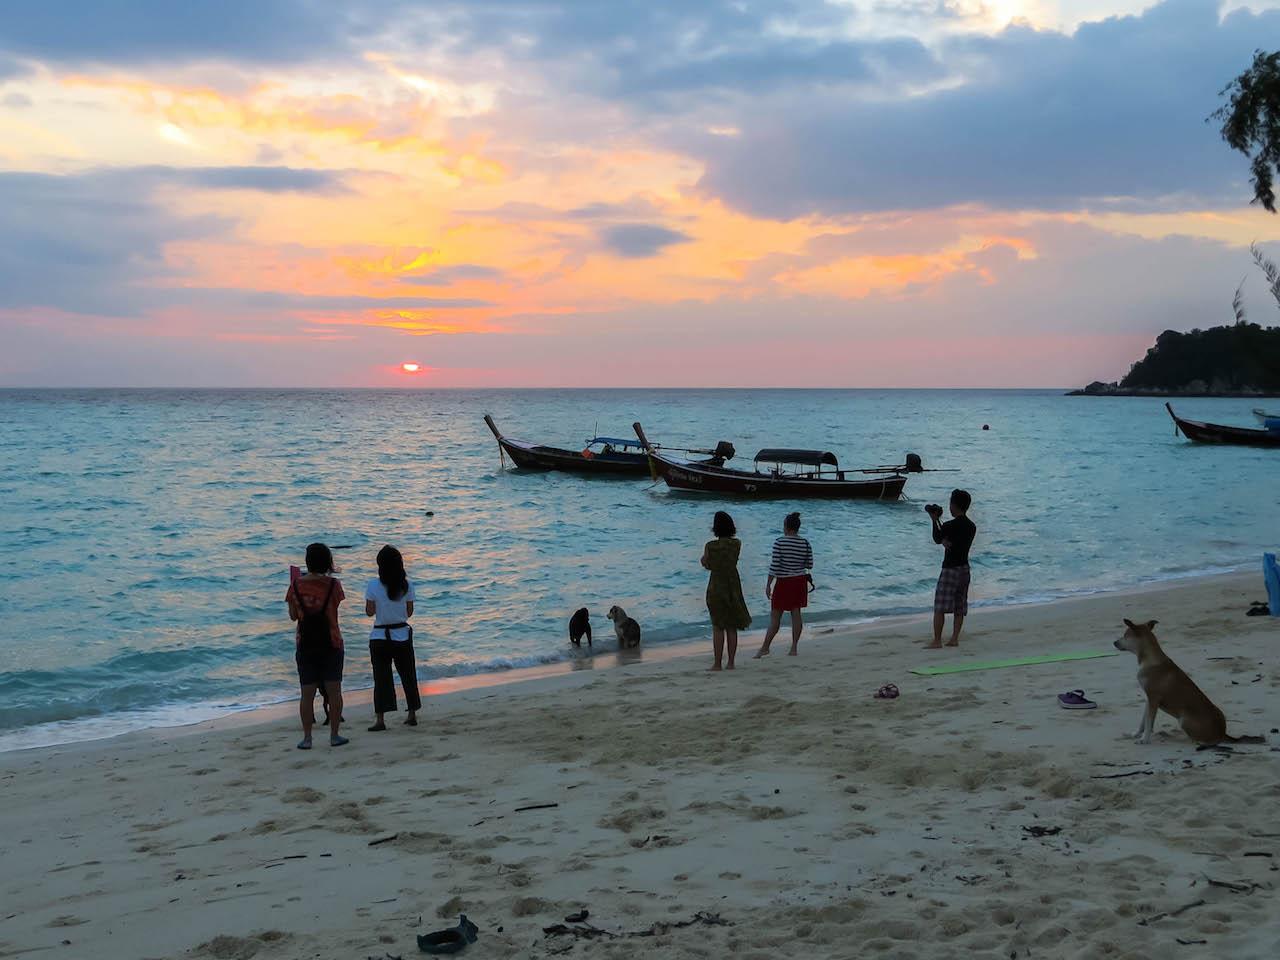 Sonnenuntergang beobachten auf Koh Lipe.